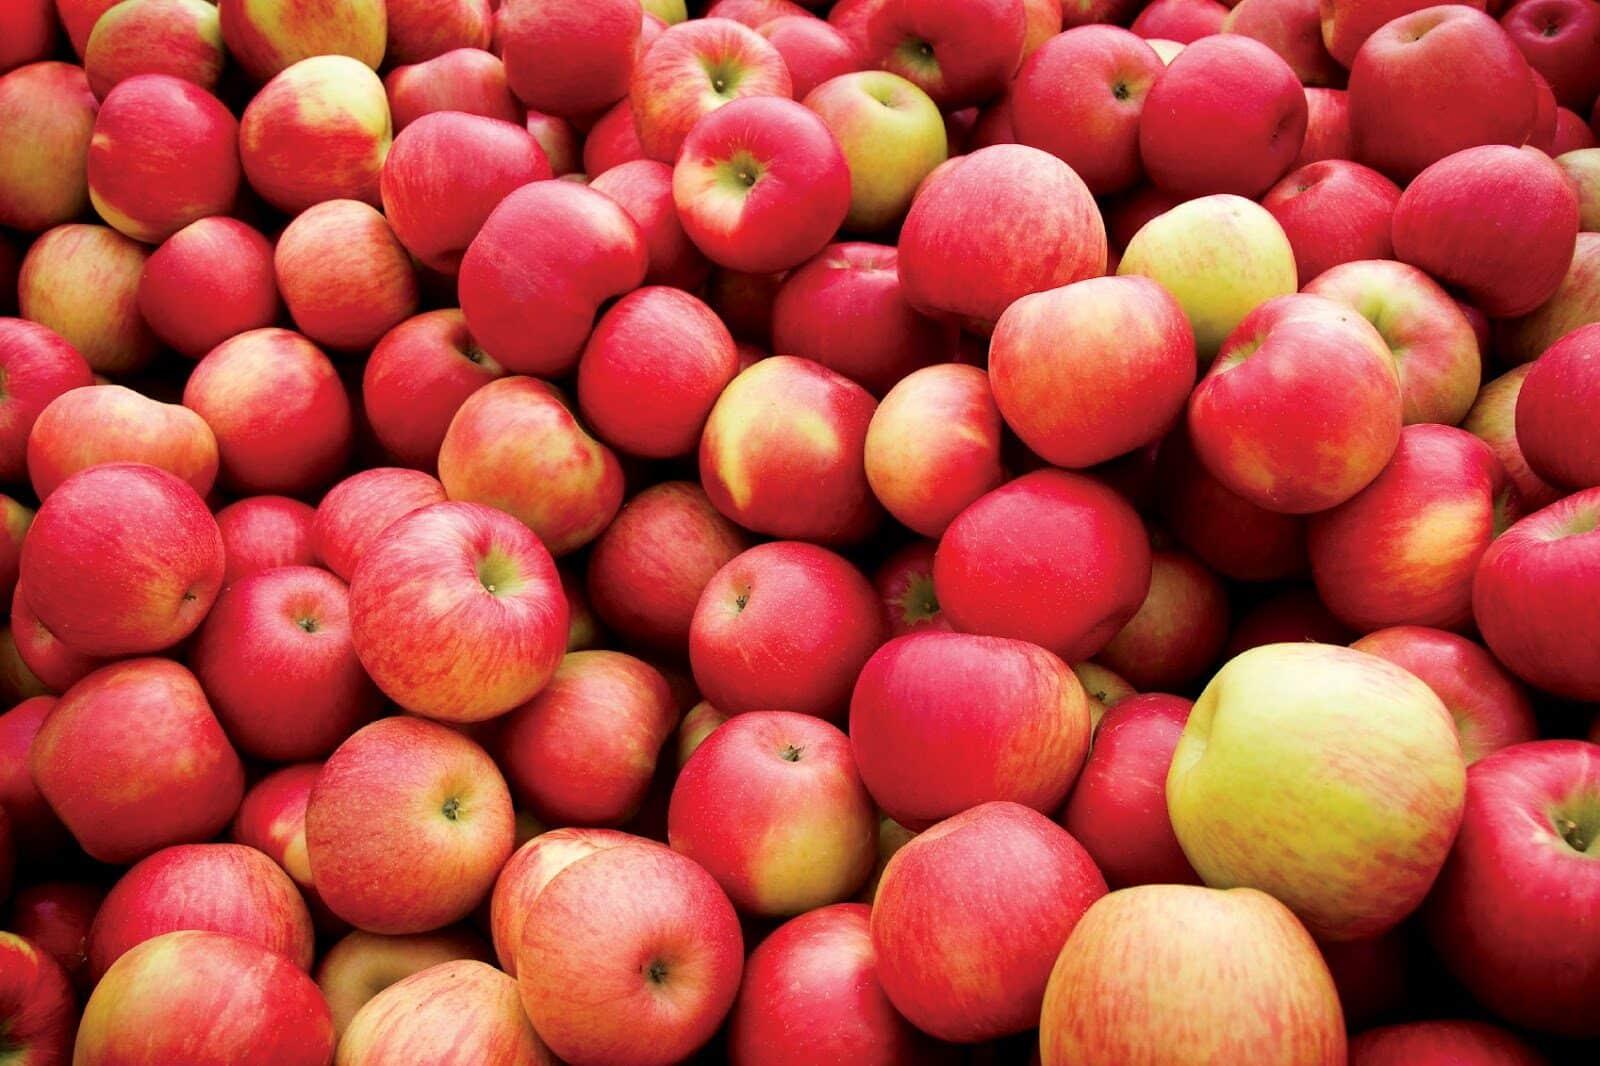 apples-2747060